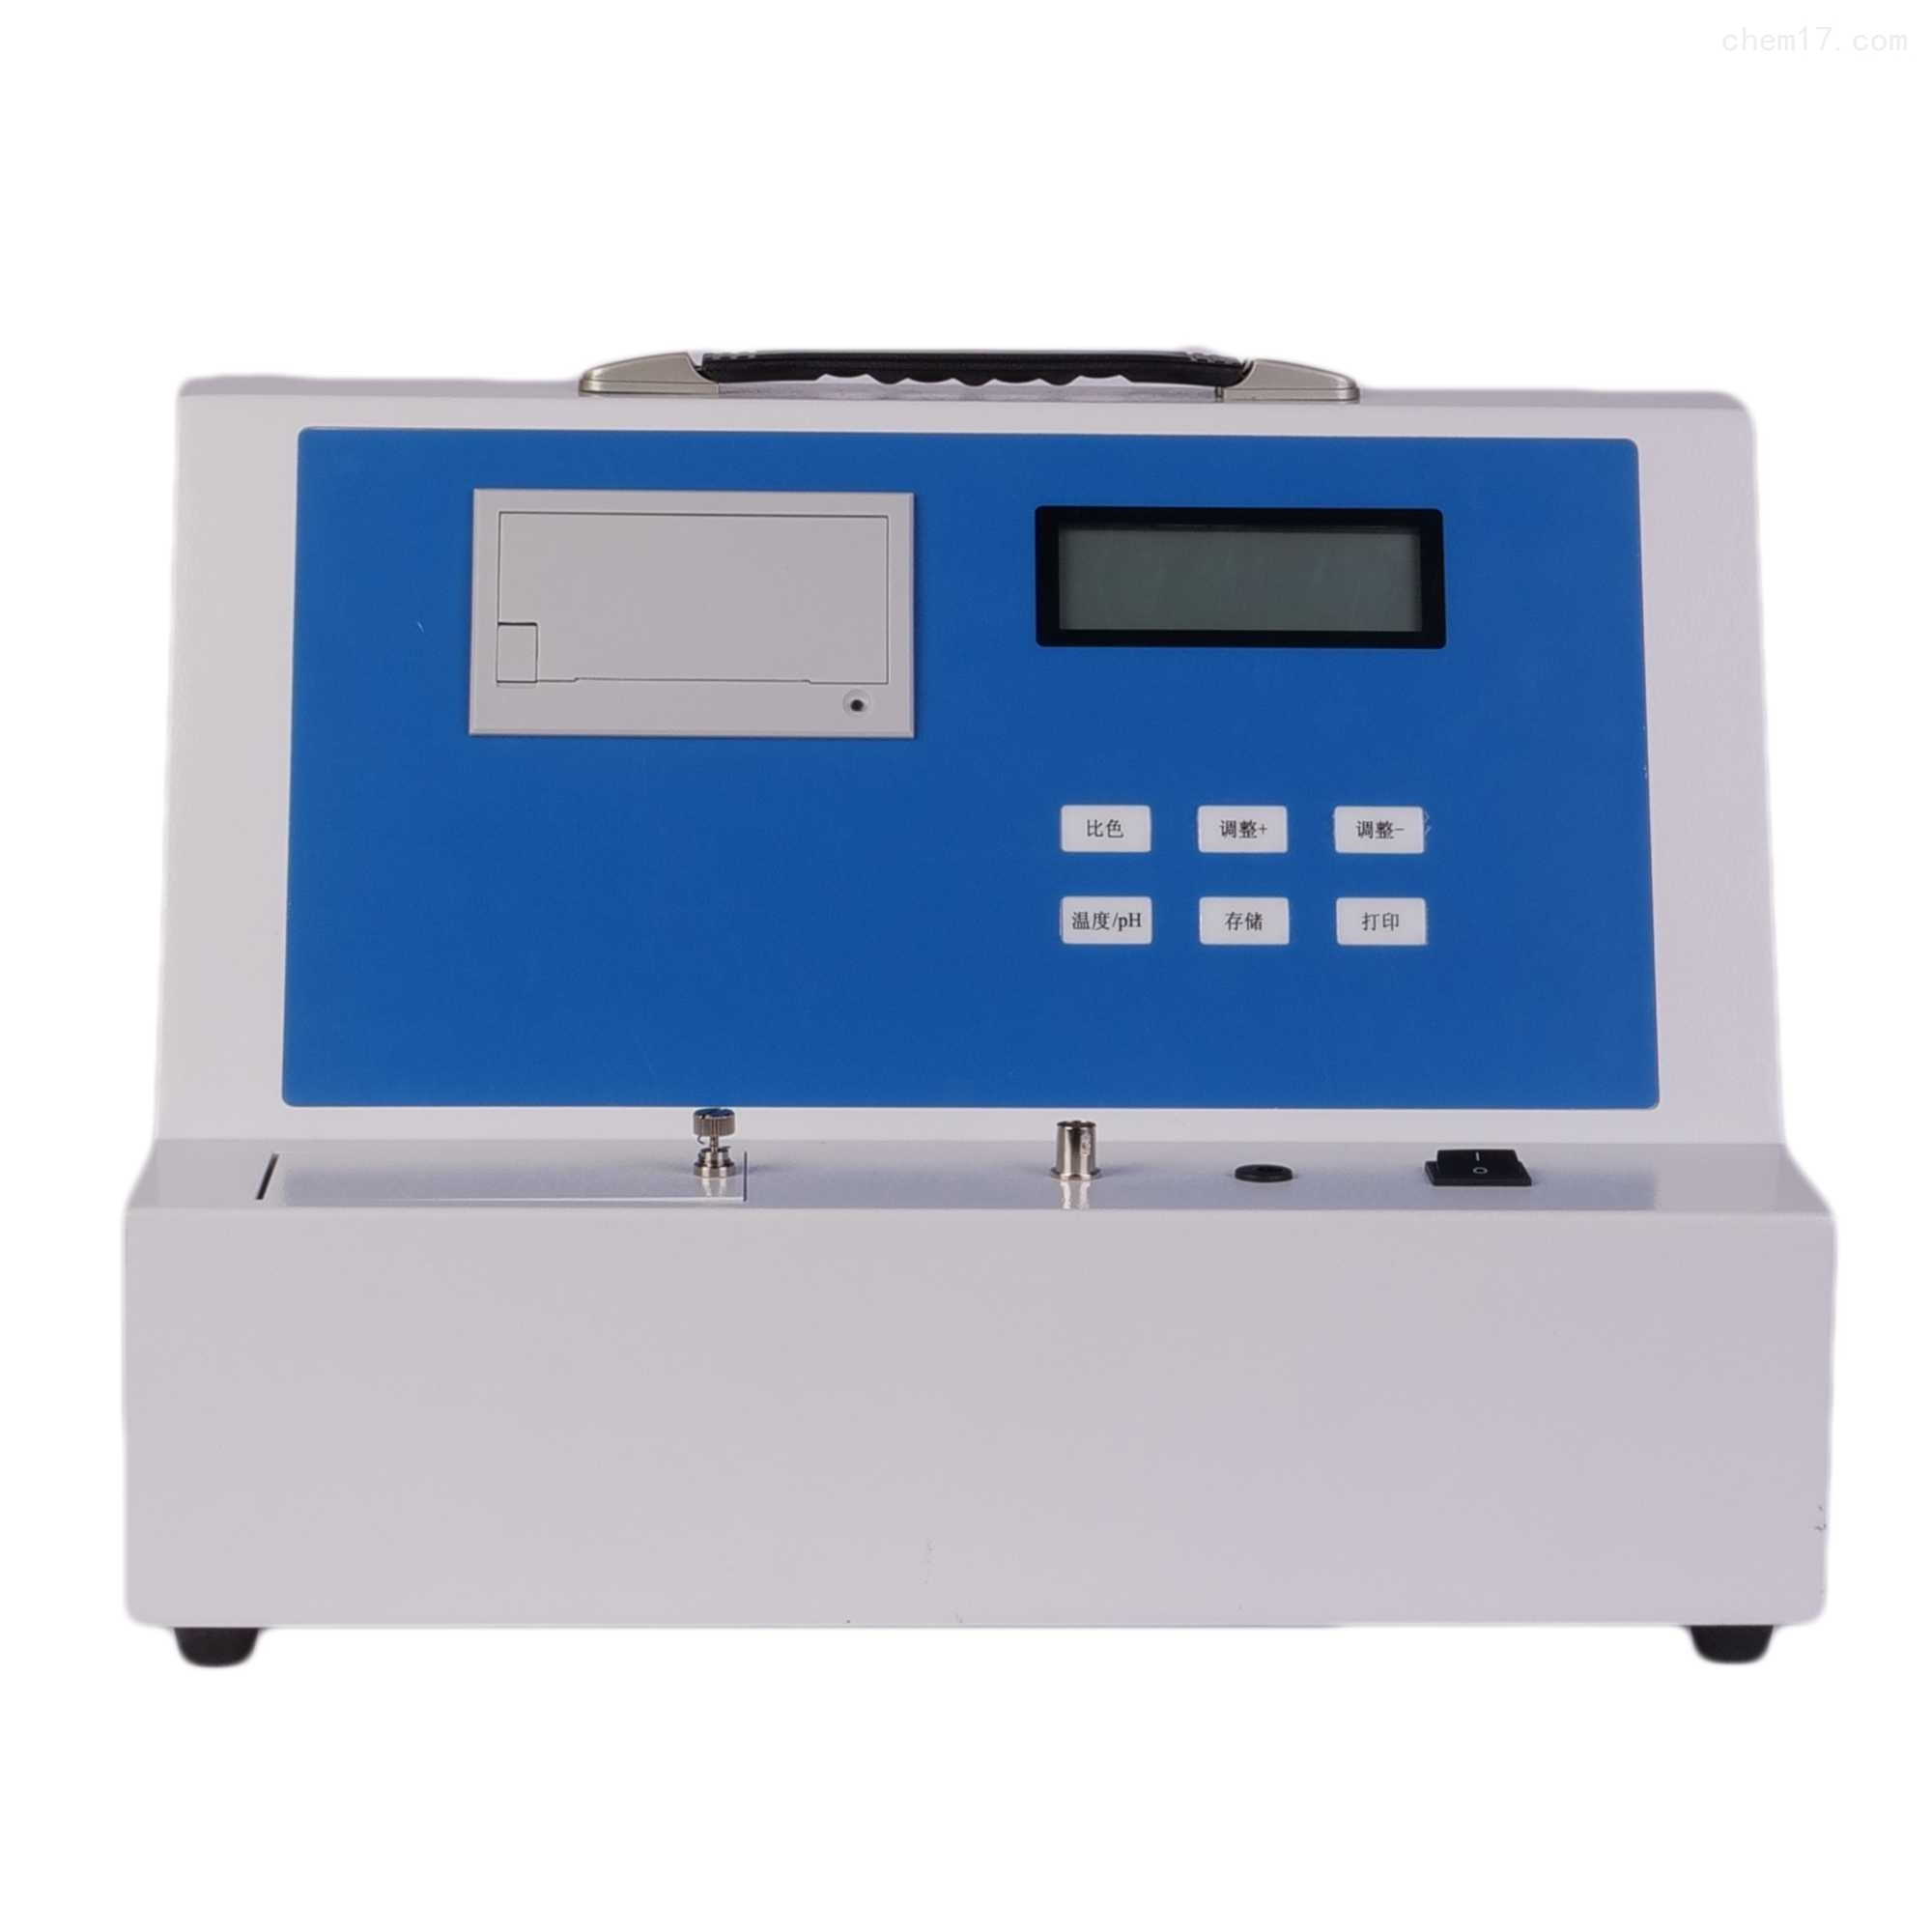 YJL-TKY03科研型土壤養分檢測儀